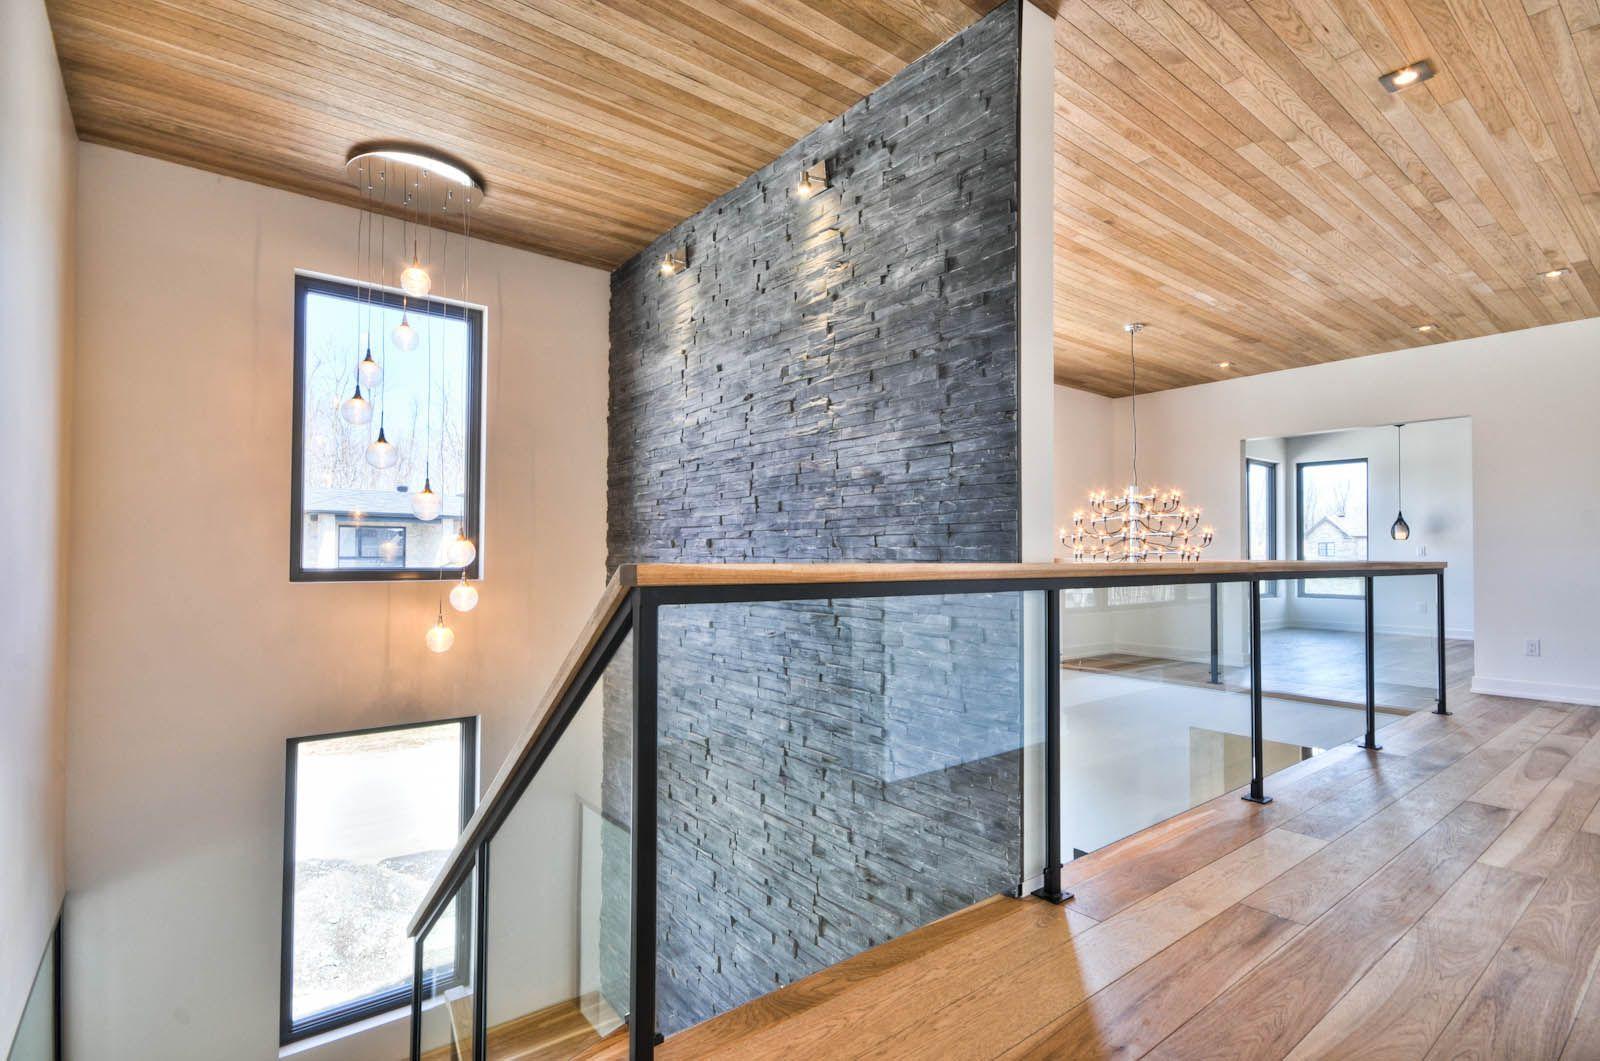 grande escalier avec mur d coratif en pierre escalier. Black Bedroom Furniture Sets. Home Design Ideas